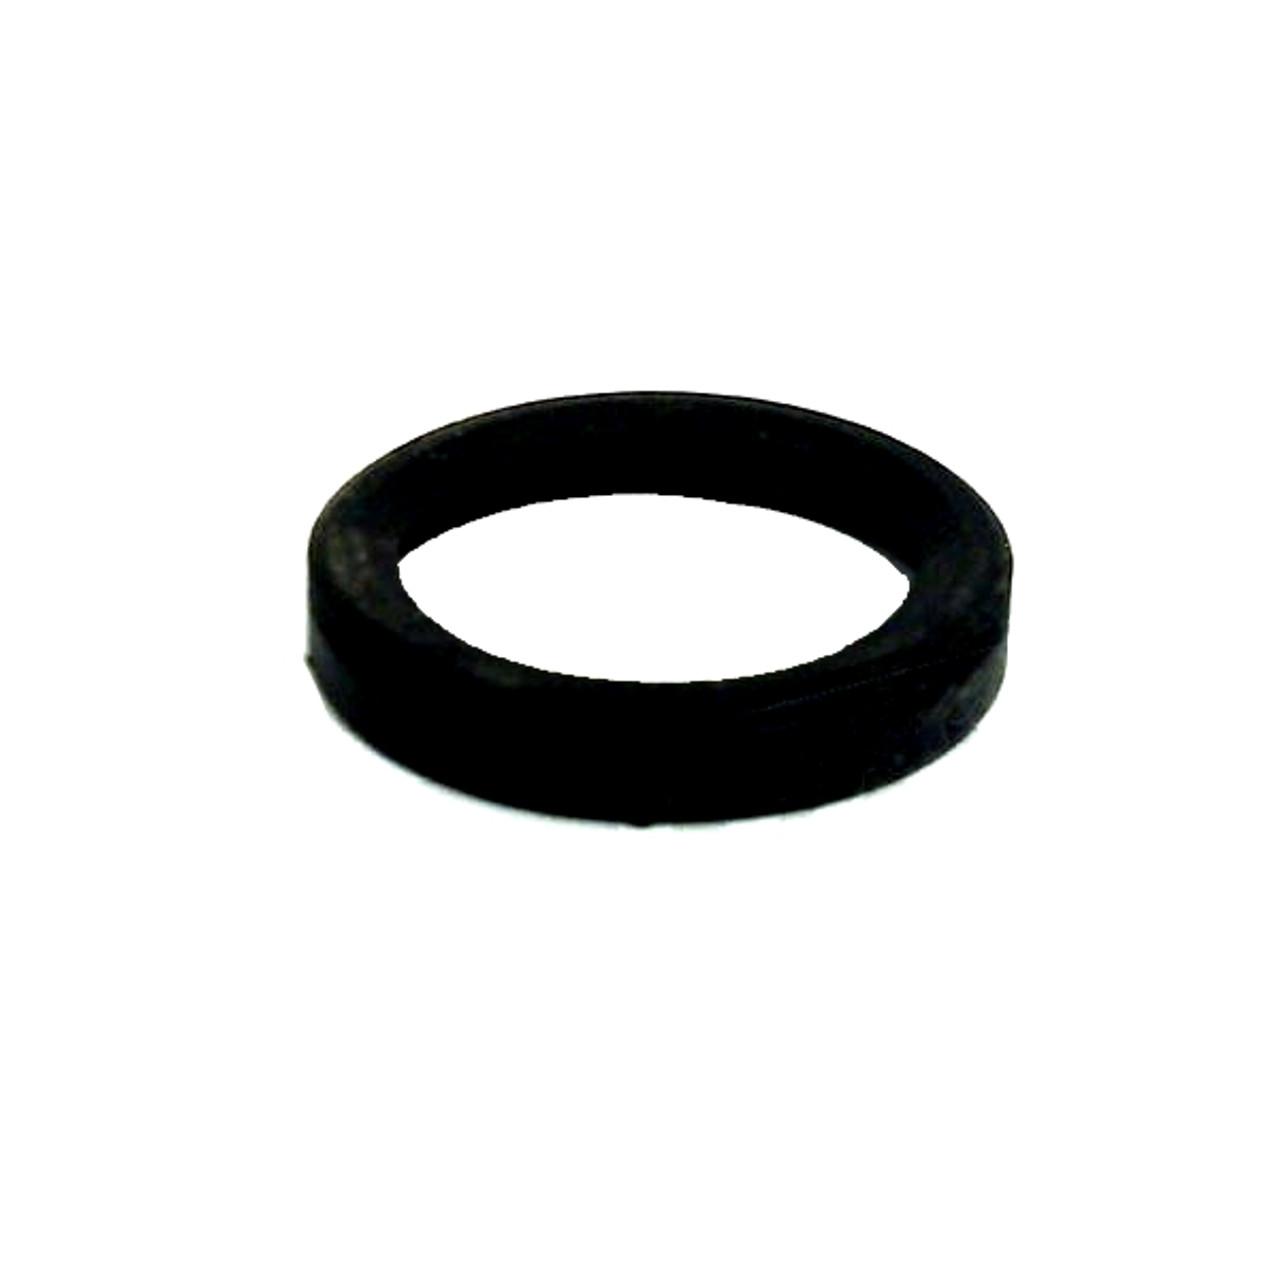 Dellorto SHA Carburetor Rubber Ring for Intake - A3 A35 Tomos Mopeds